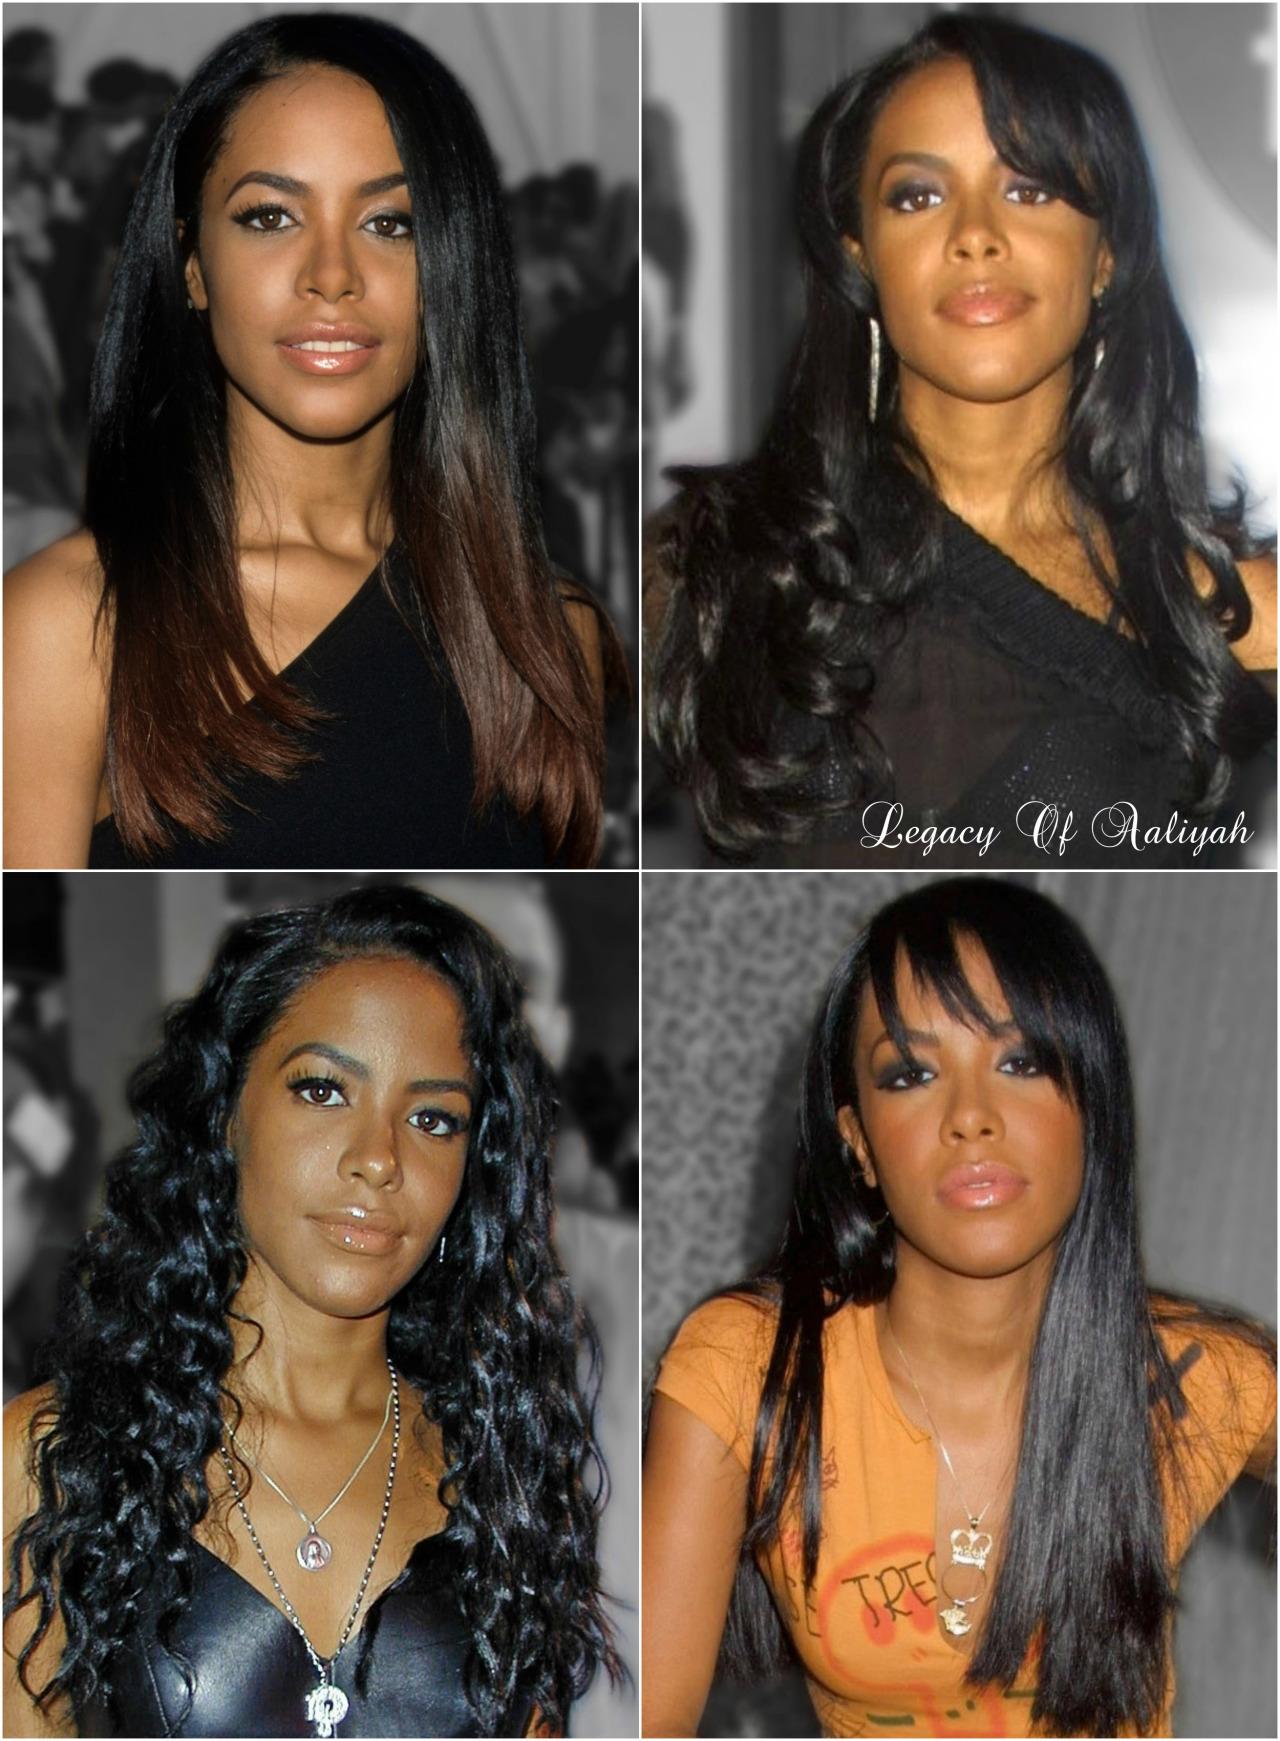 Aaliyah Hairstyle : aaliyah, hairstyle, Legacy, Aaliyah